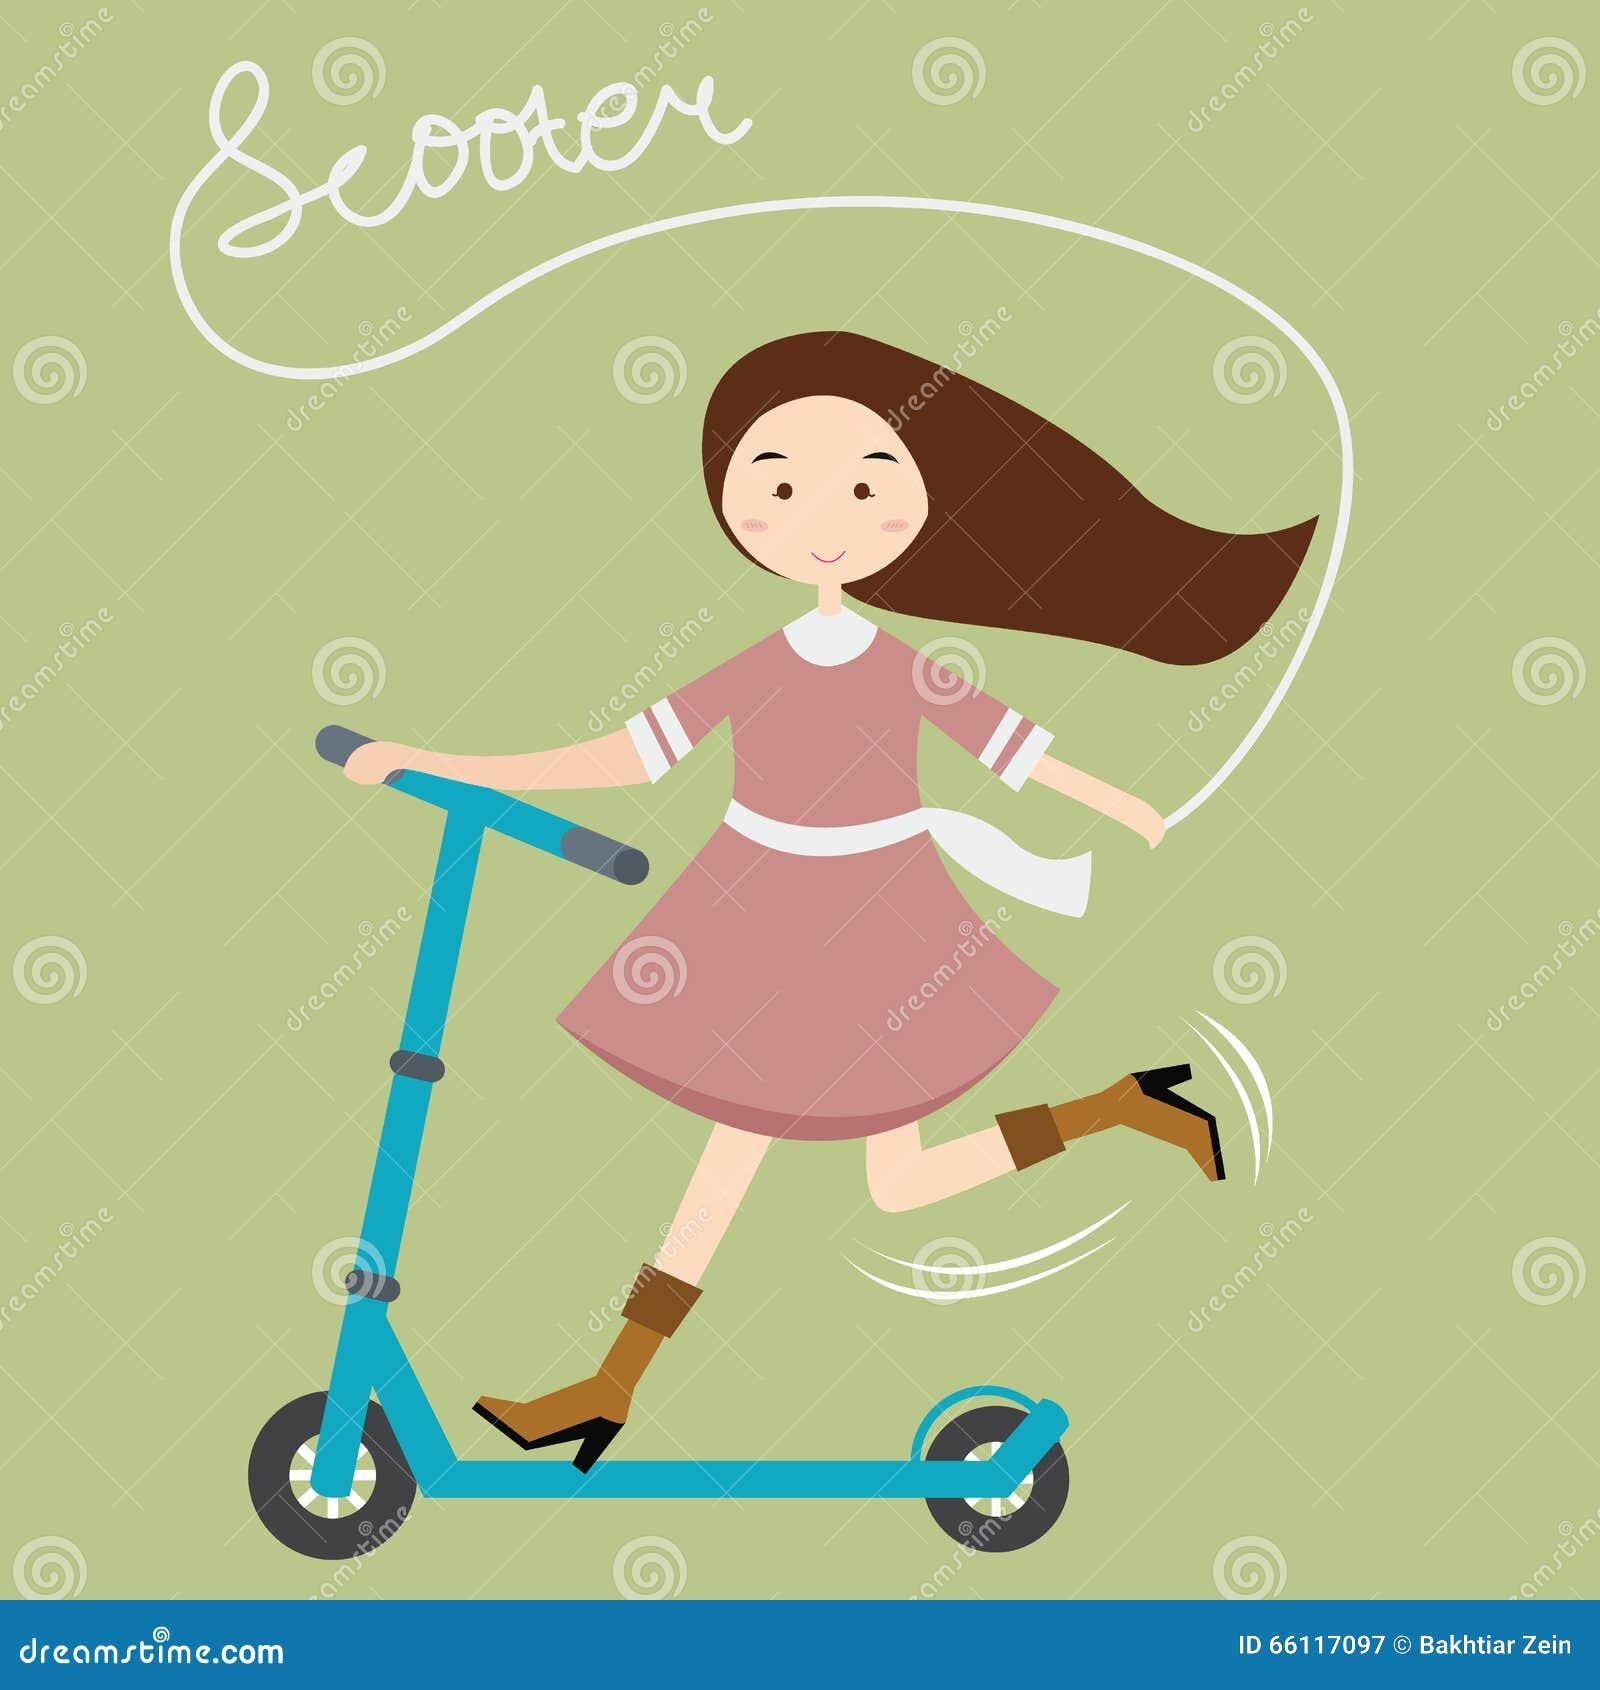 Girls kids female having fun riding scooter happy child active beautiful